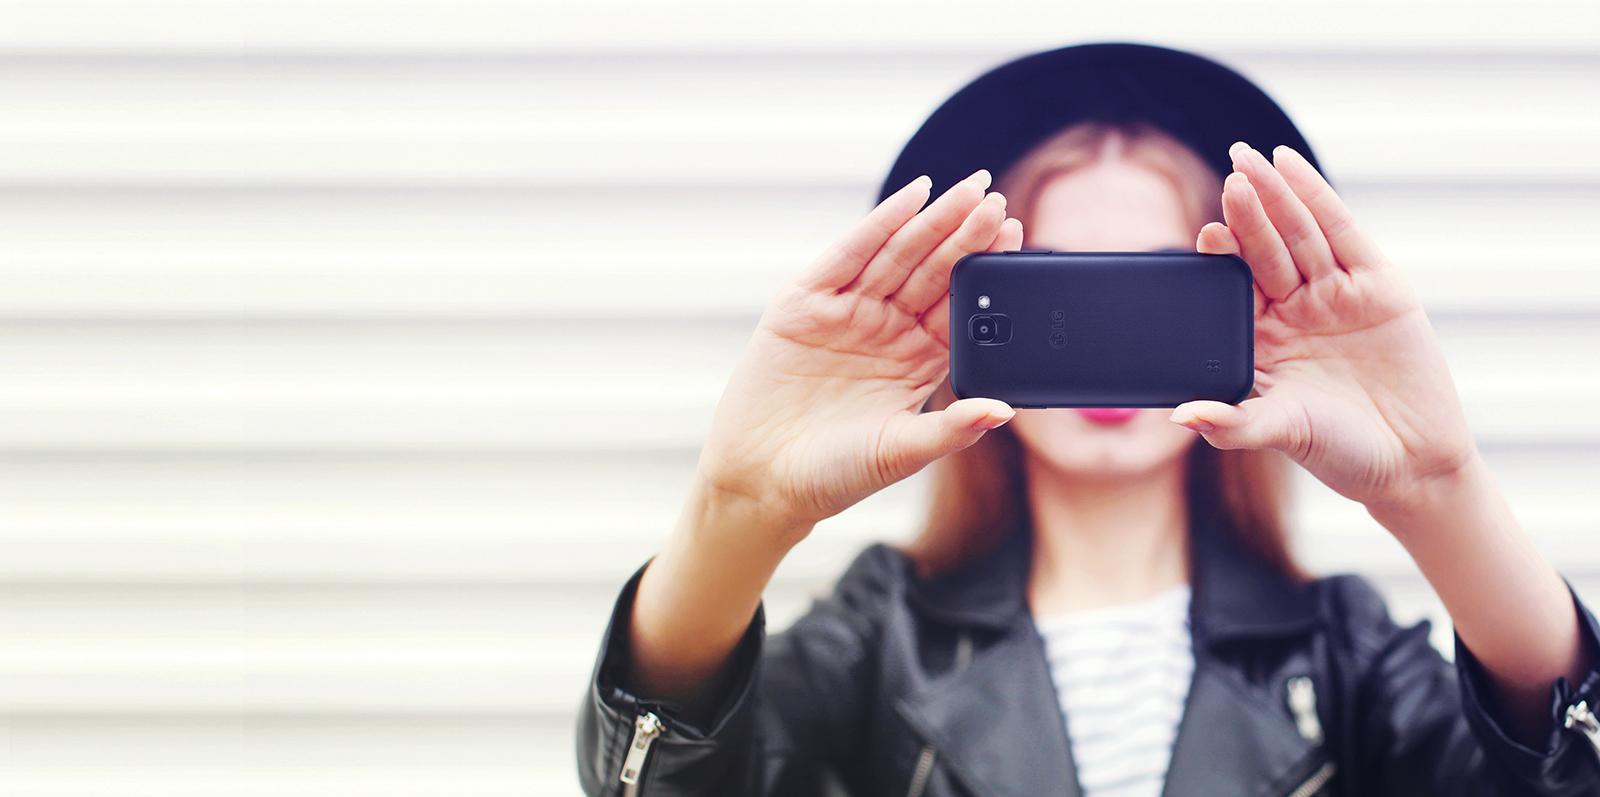 LG Phones: Explore LG\'s Full Range of Cell Phones | LG USA